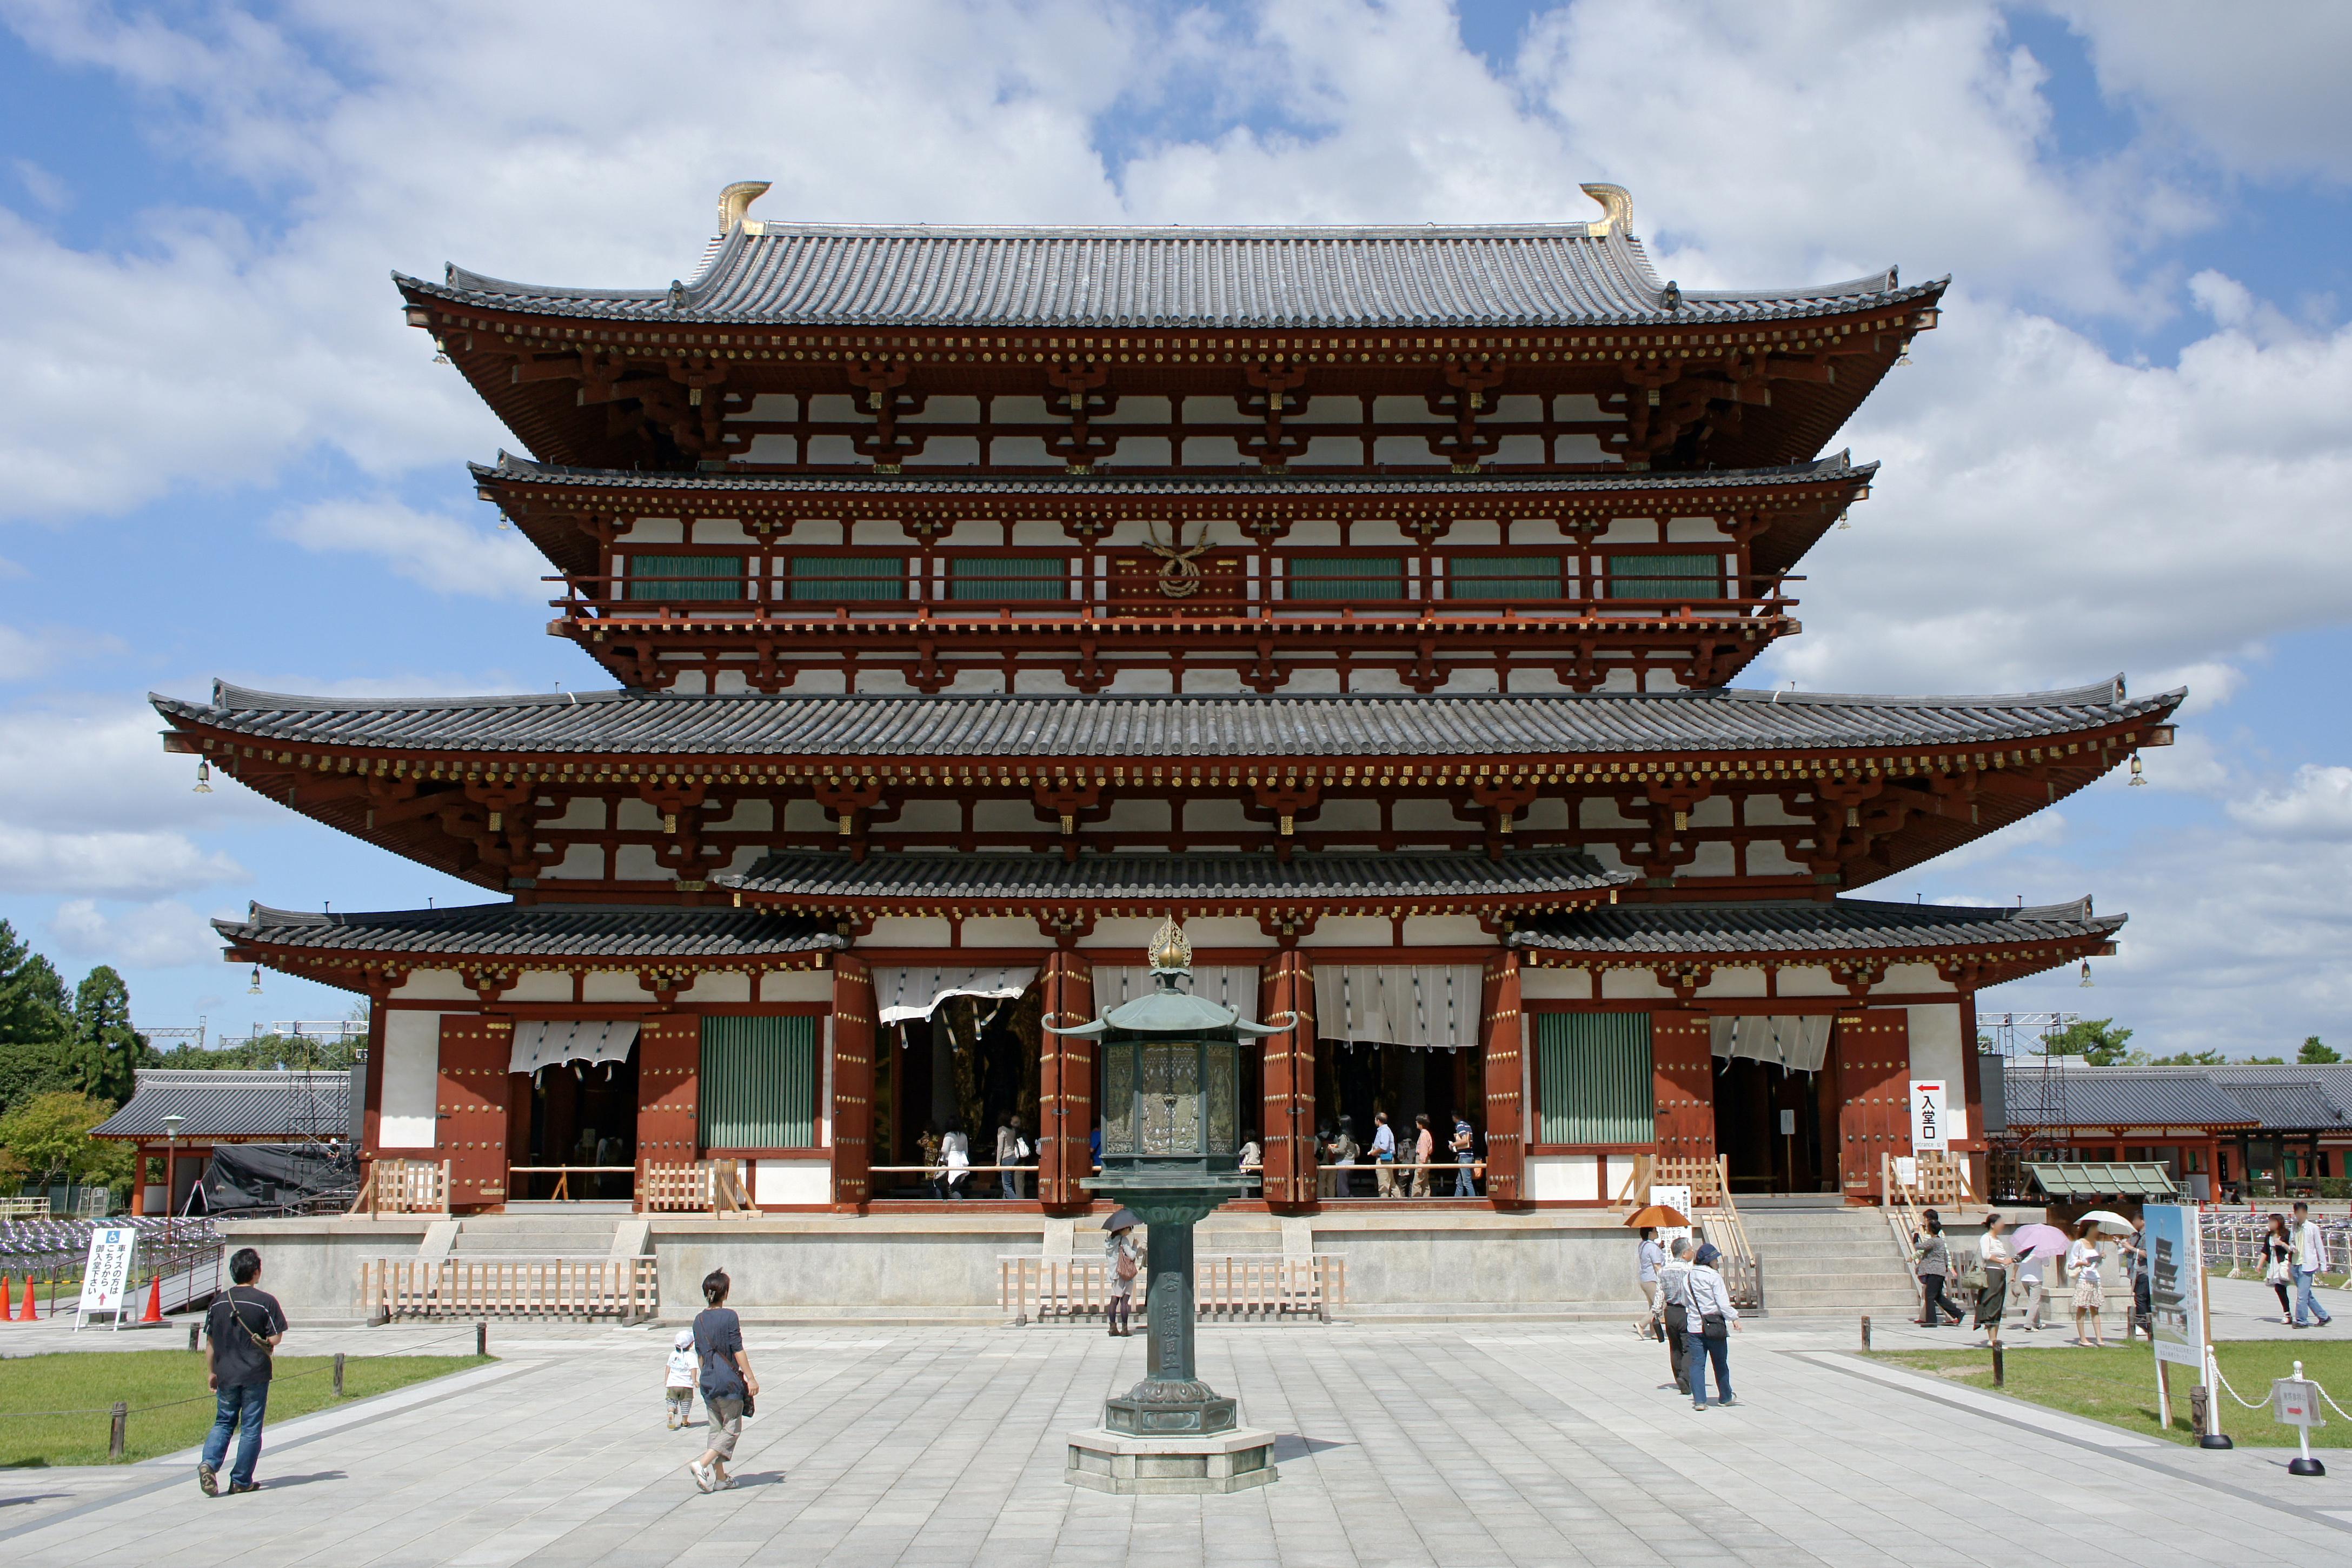 File:Yakushiji Nara03s3s4350.jpg - Wikimedia Commons